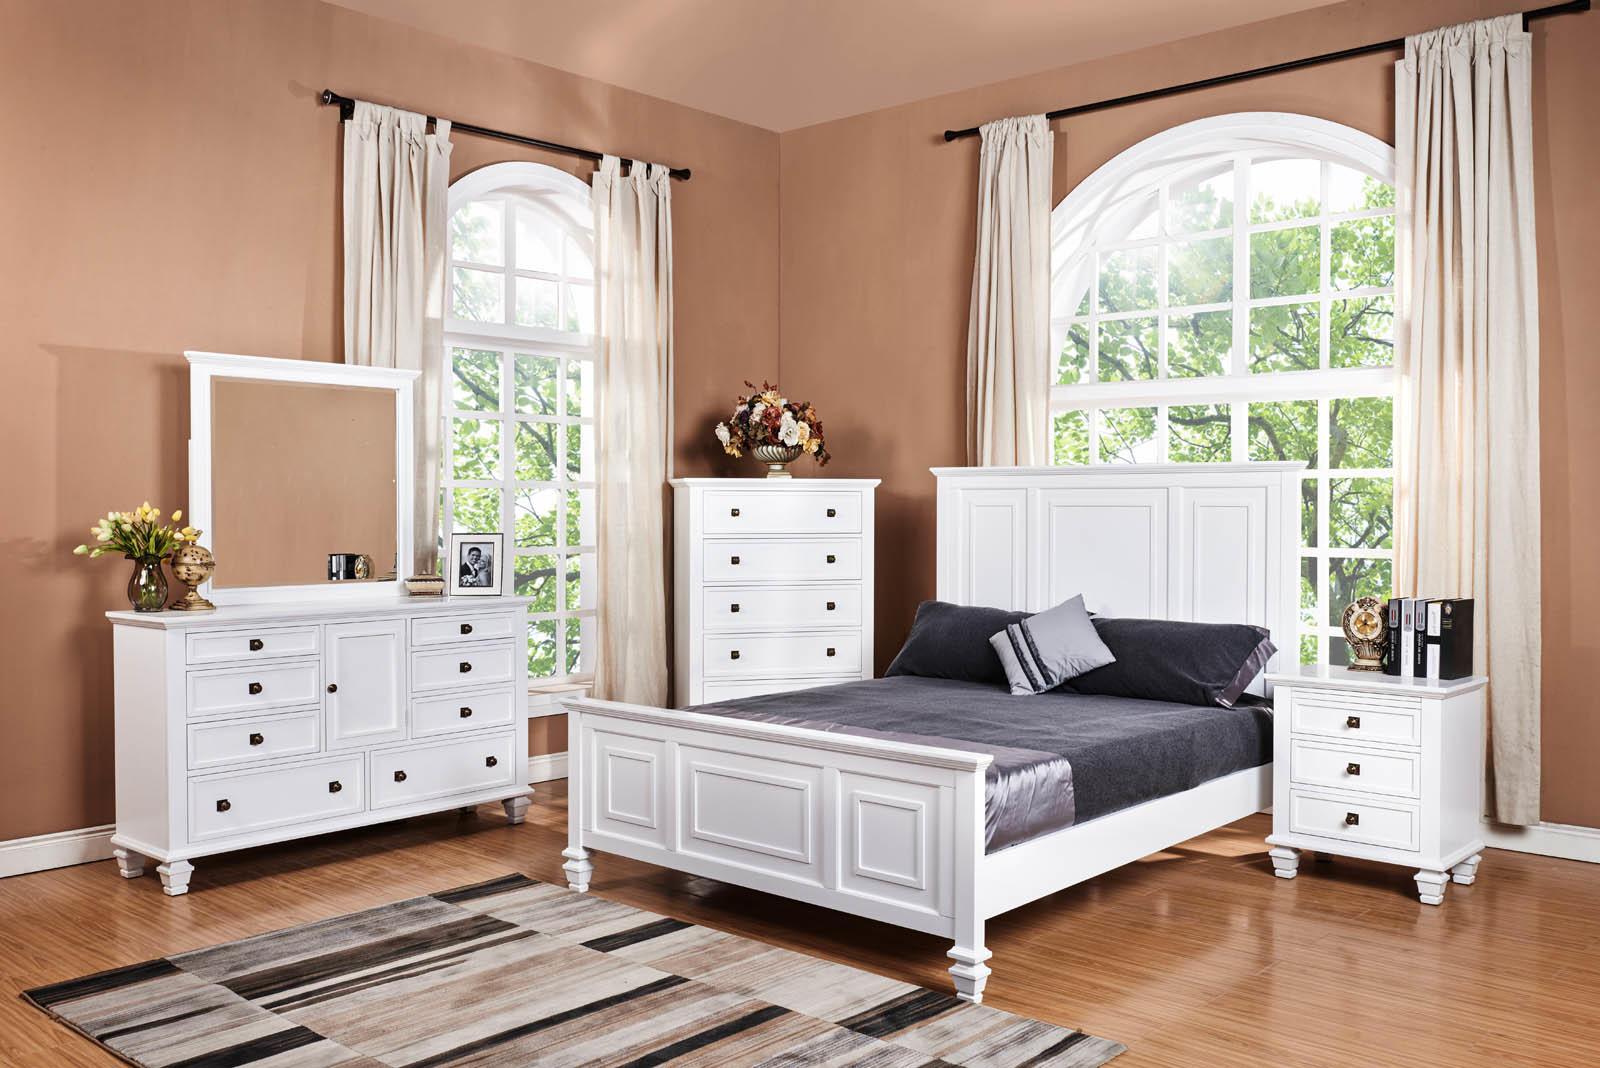 Solid White Bedroom Furniture White Bedroom Furniture